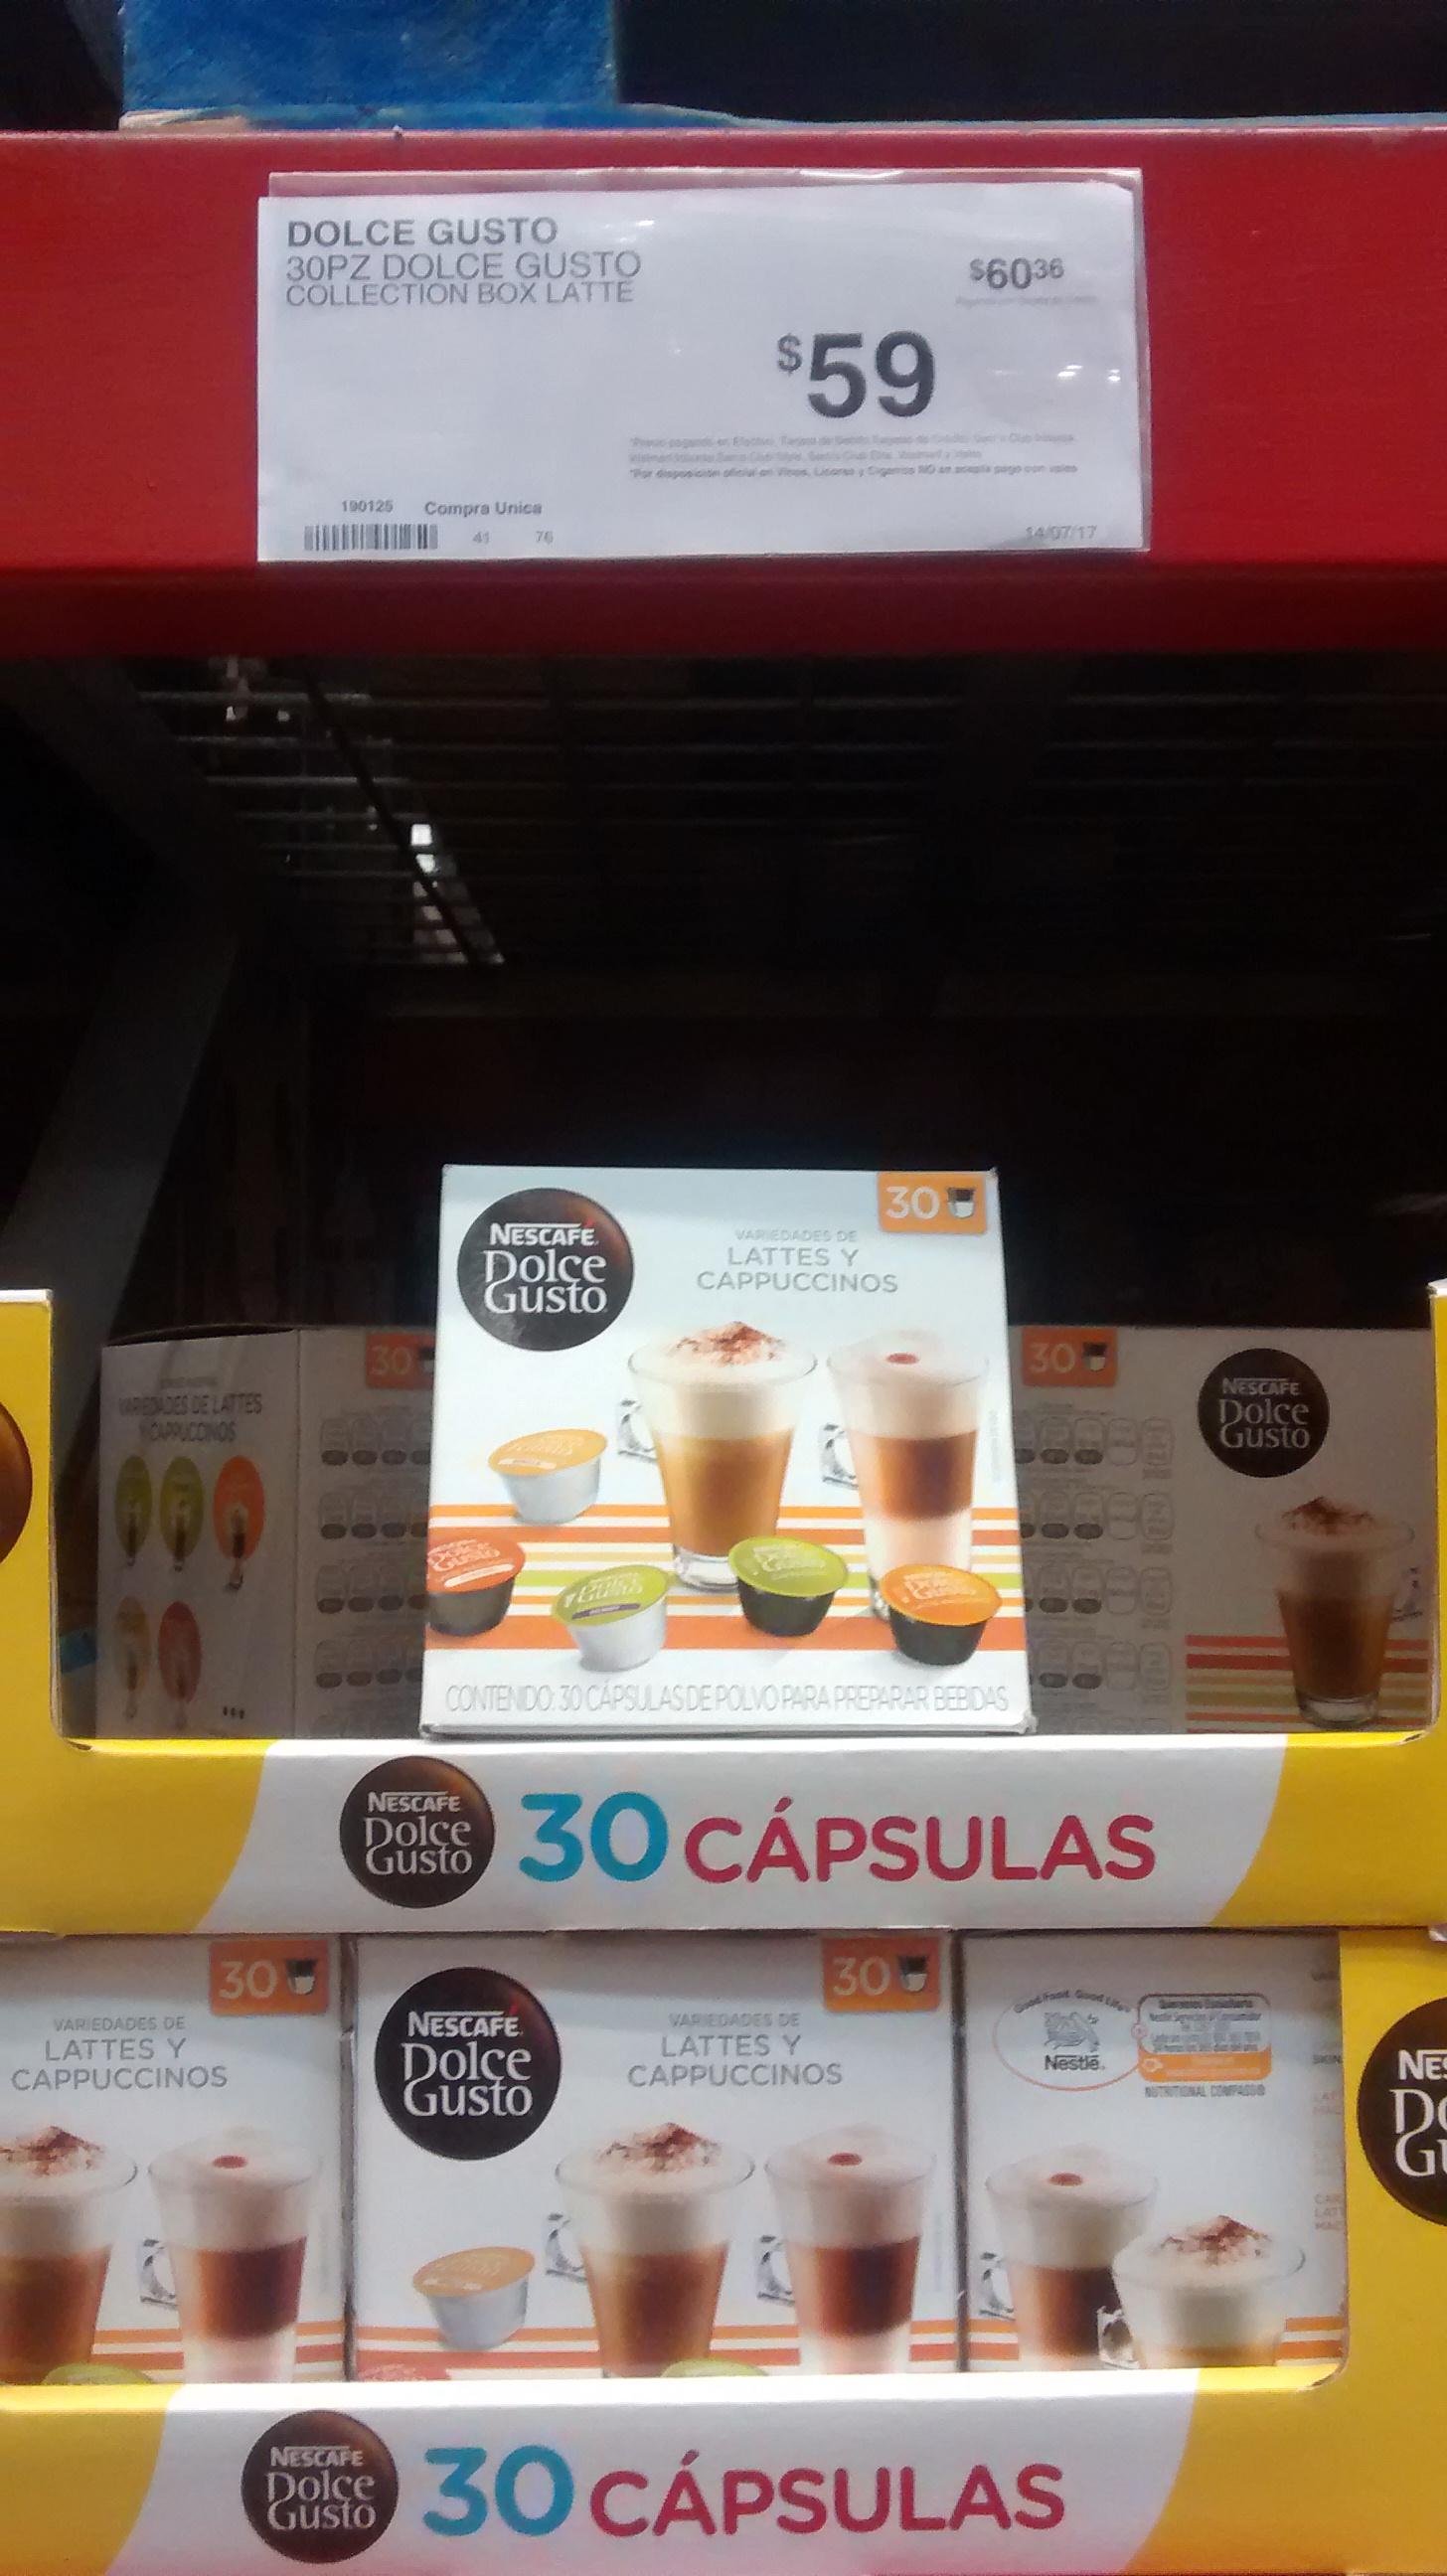 Sam's Club: 30 Cap. Dolce Gusto Lattes y Cappuccinos